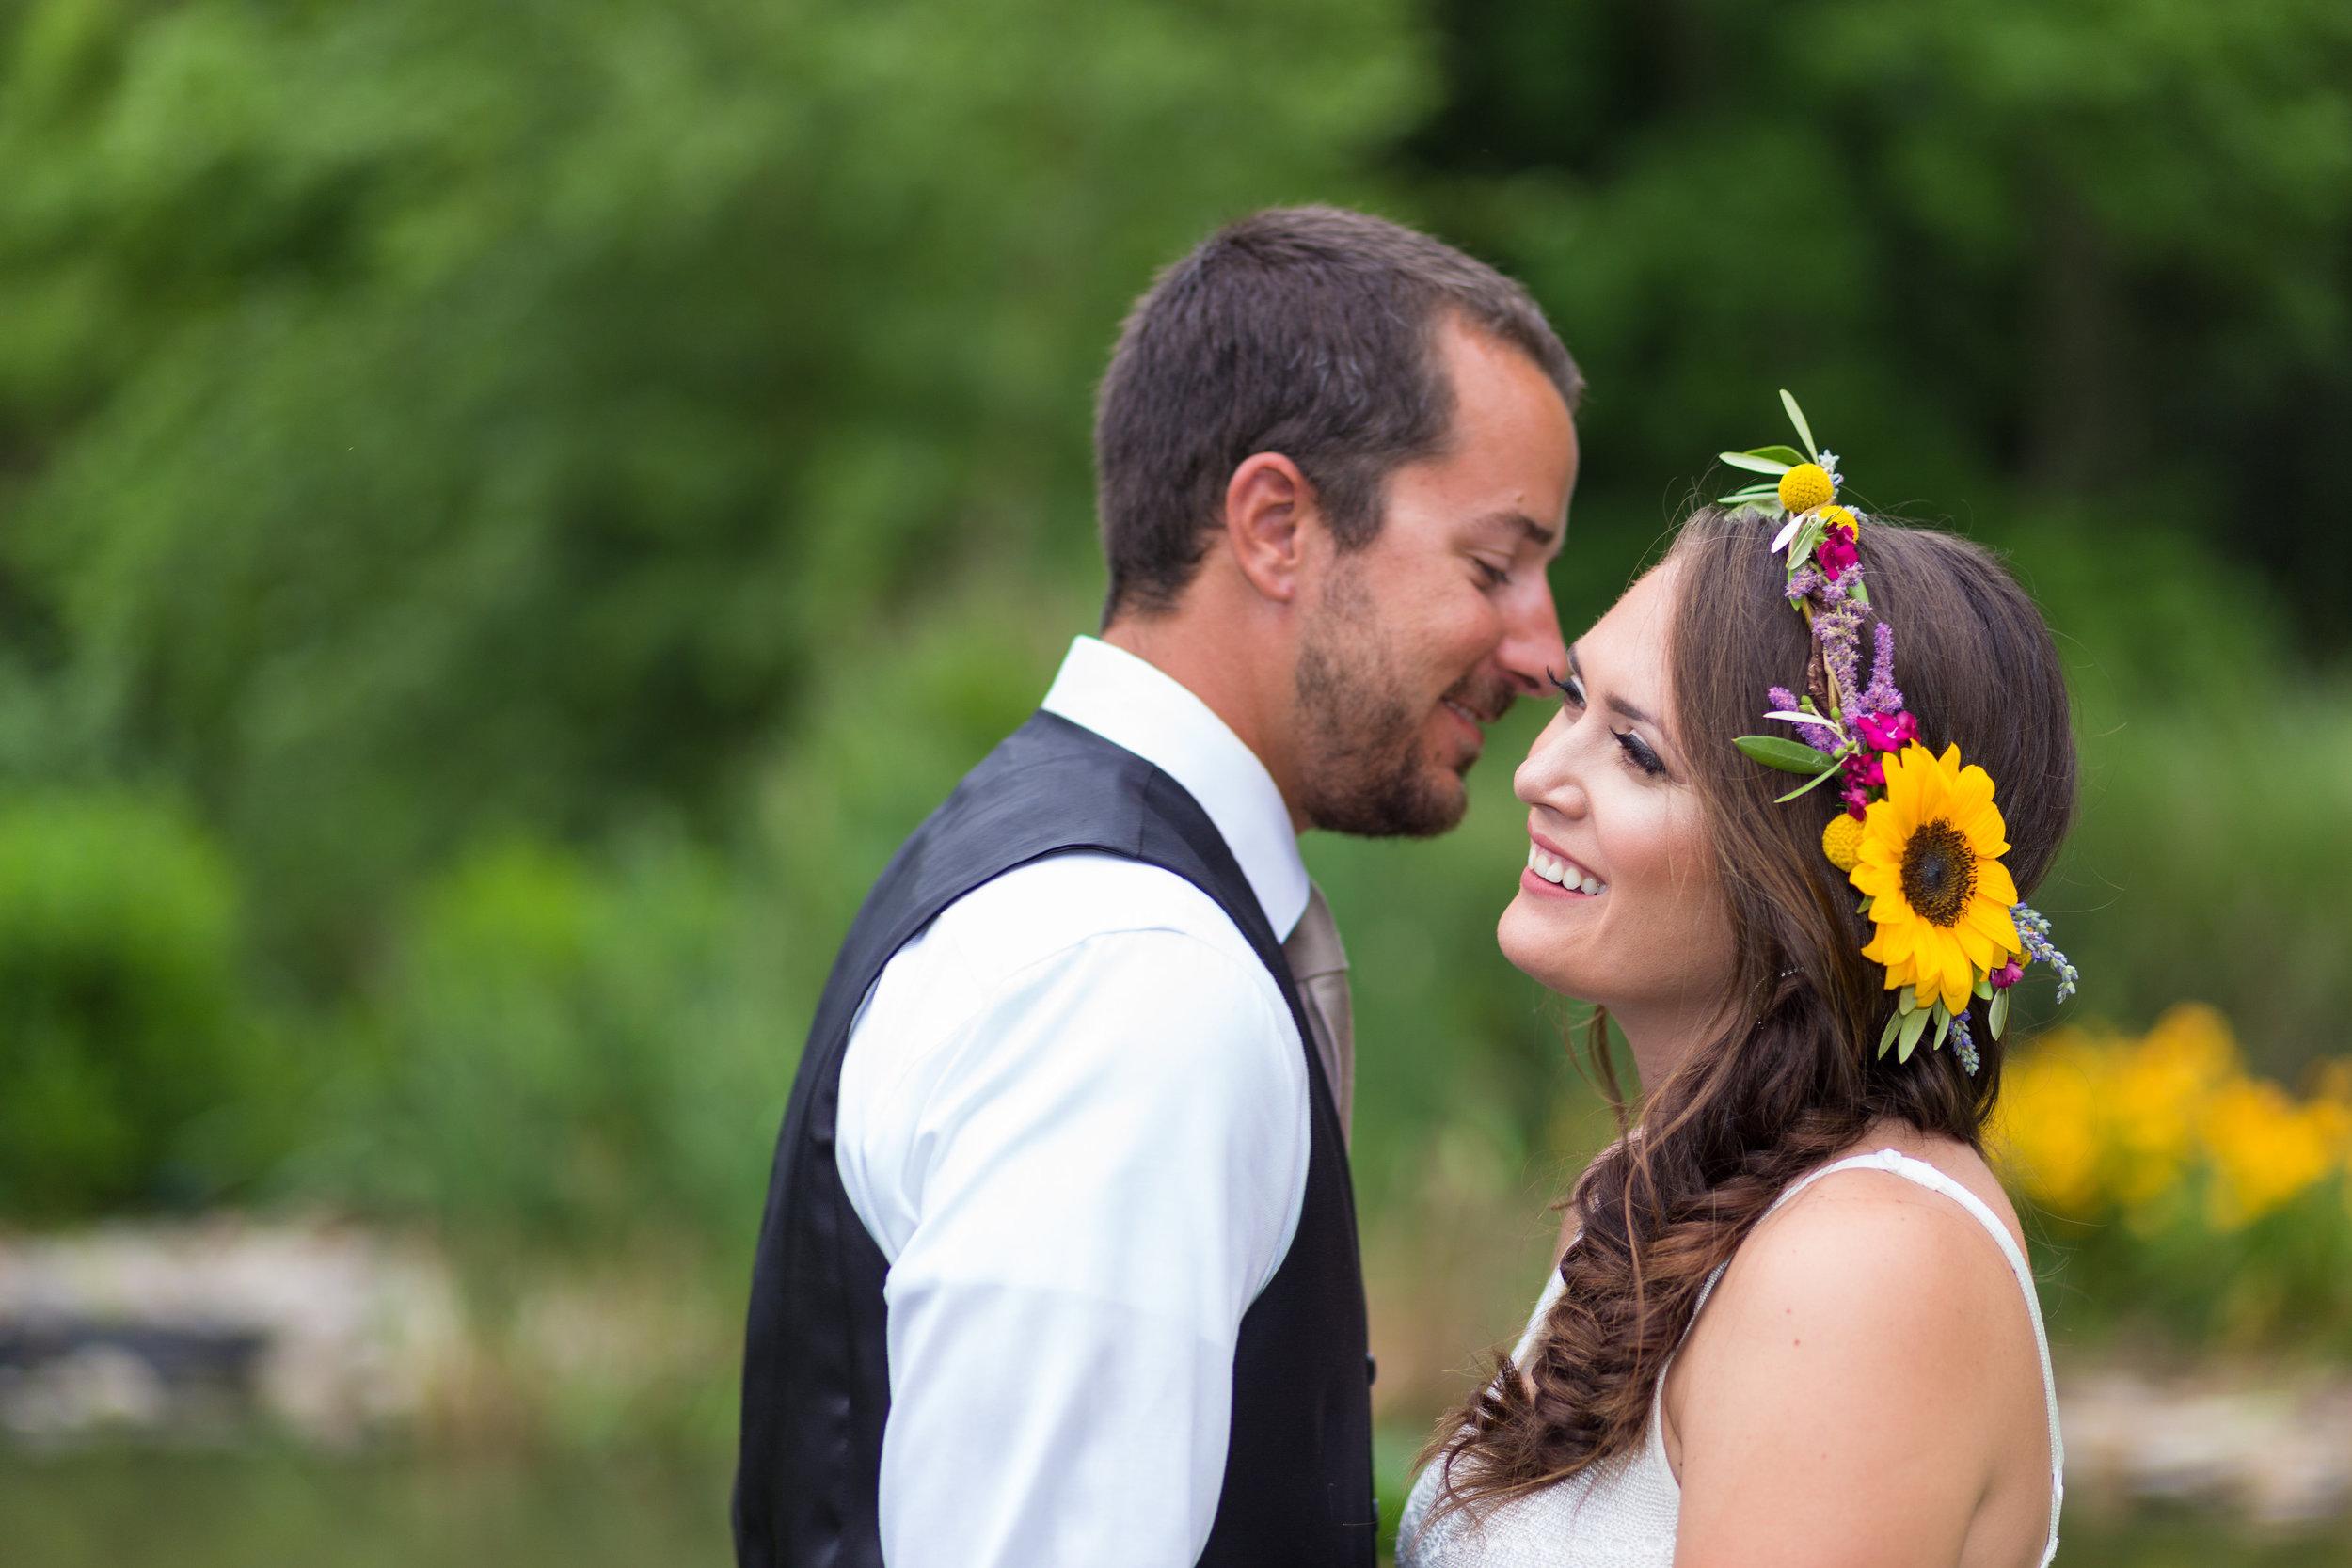 NJ Wedding, Bride, Flower Crown, Sunflower Wedding, Boho, Love Story Studios